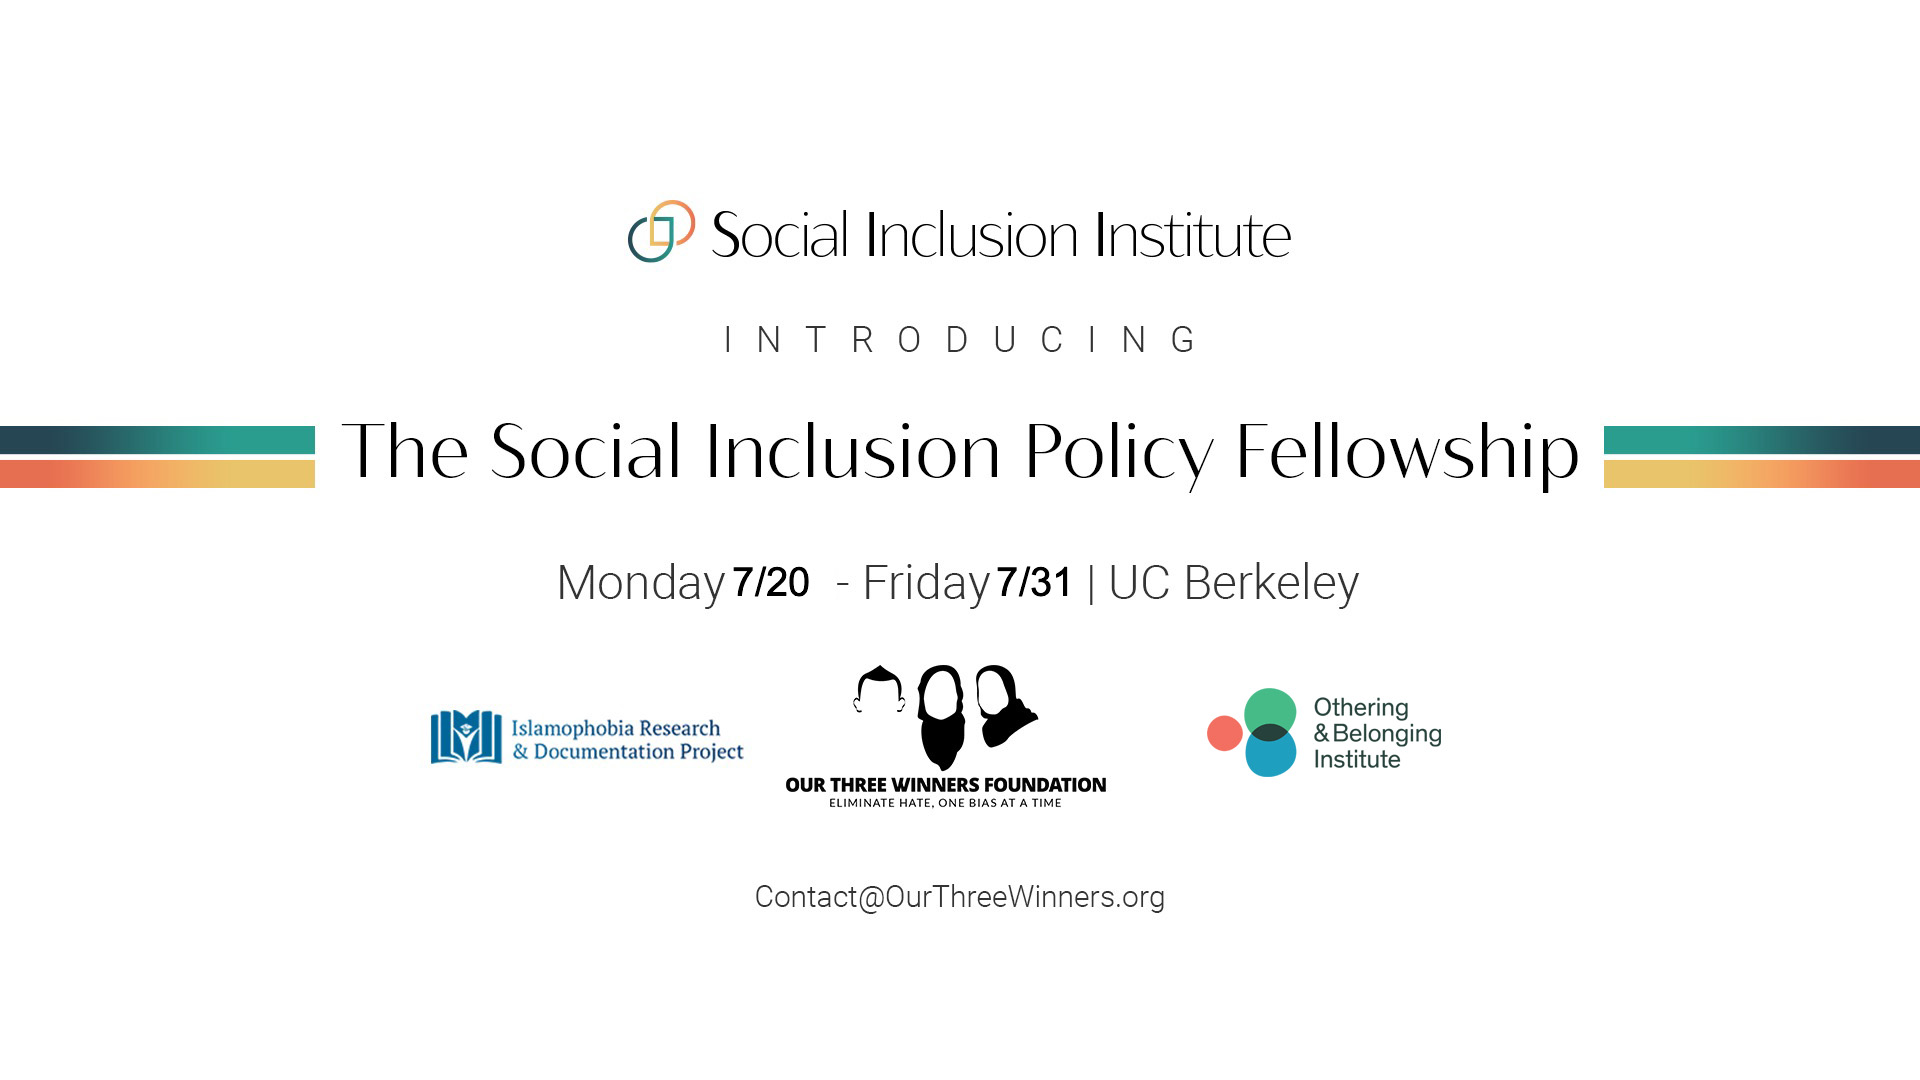 social inclusion policy fellowship